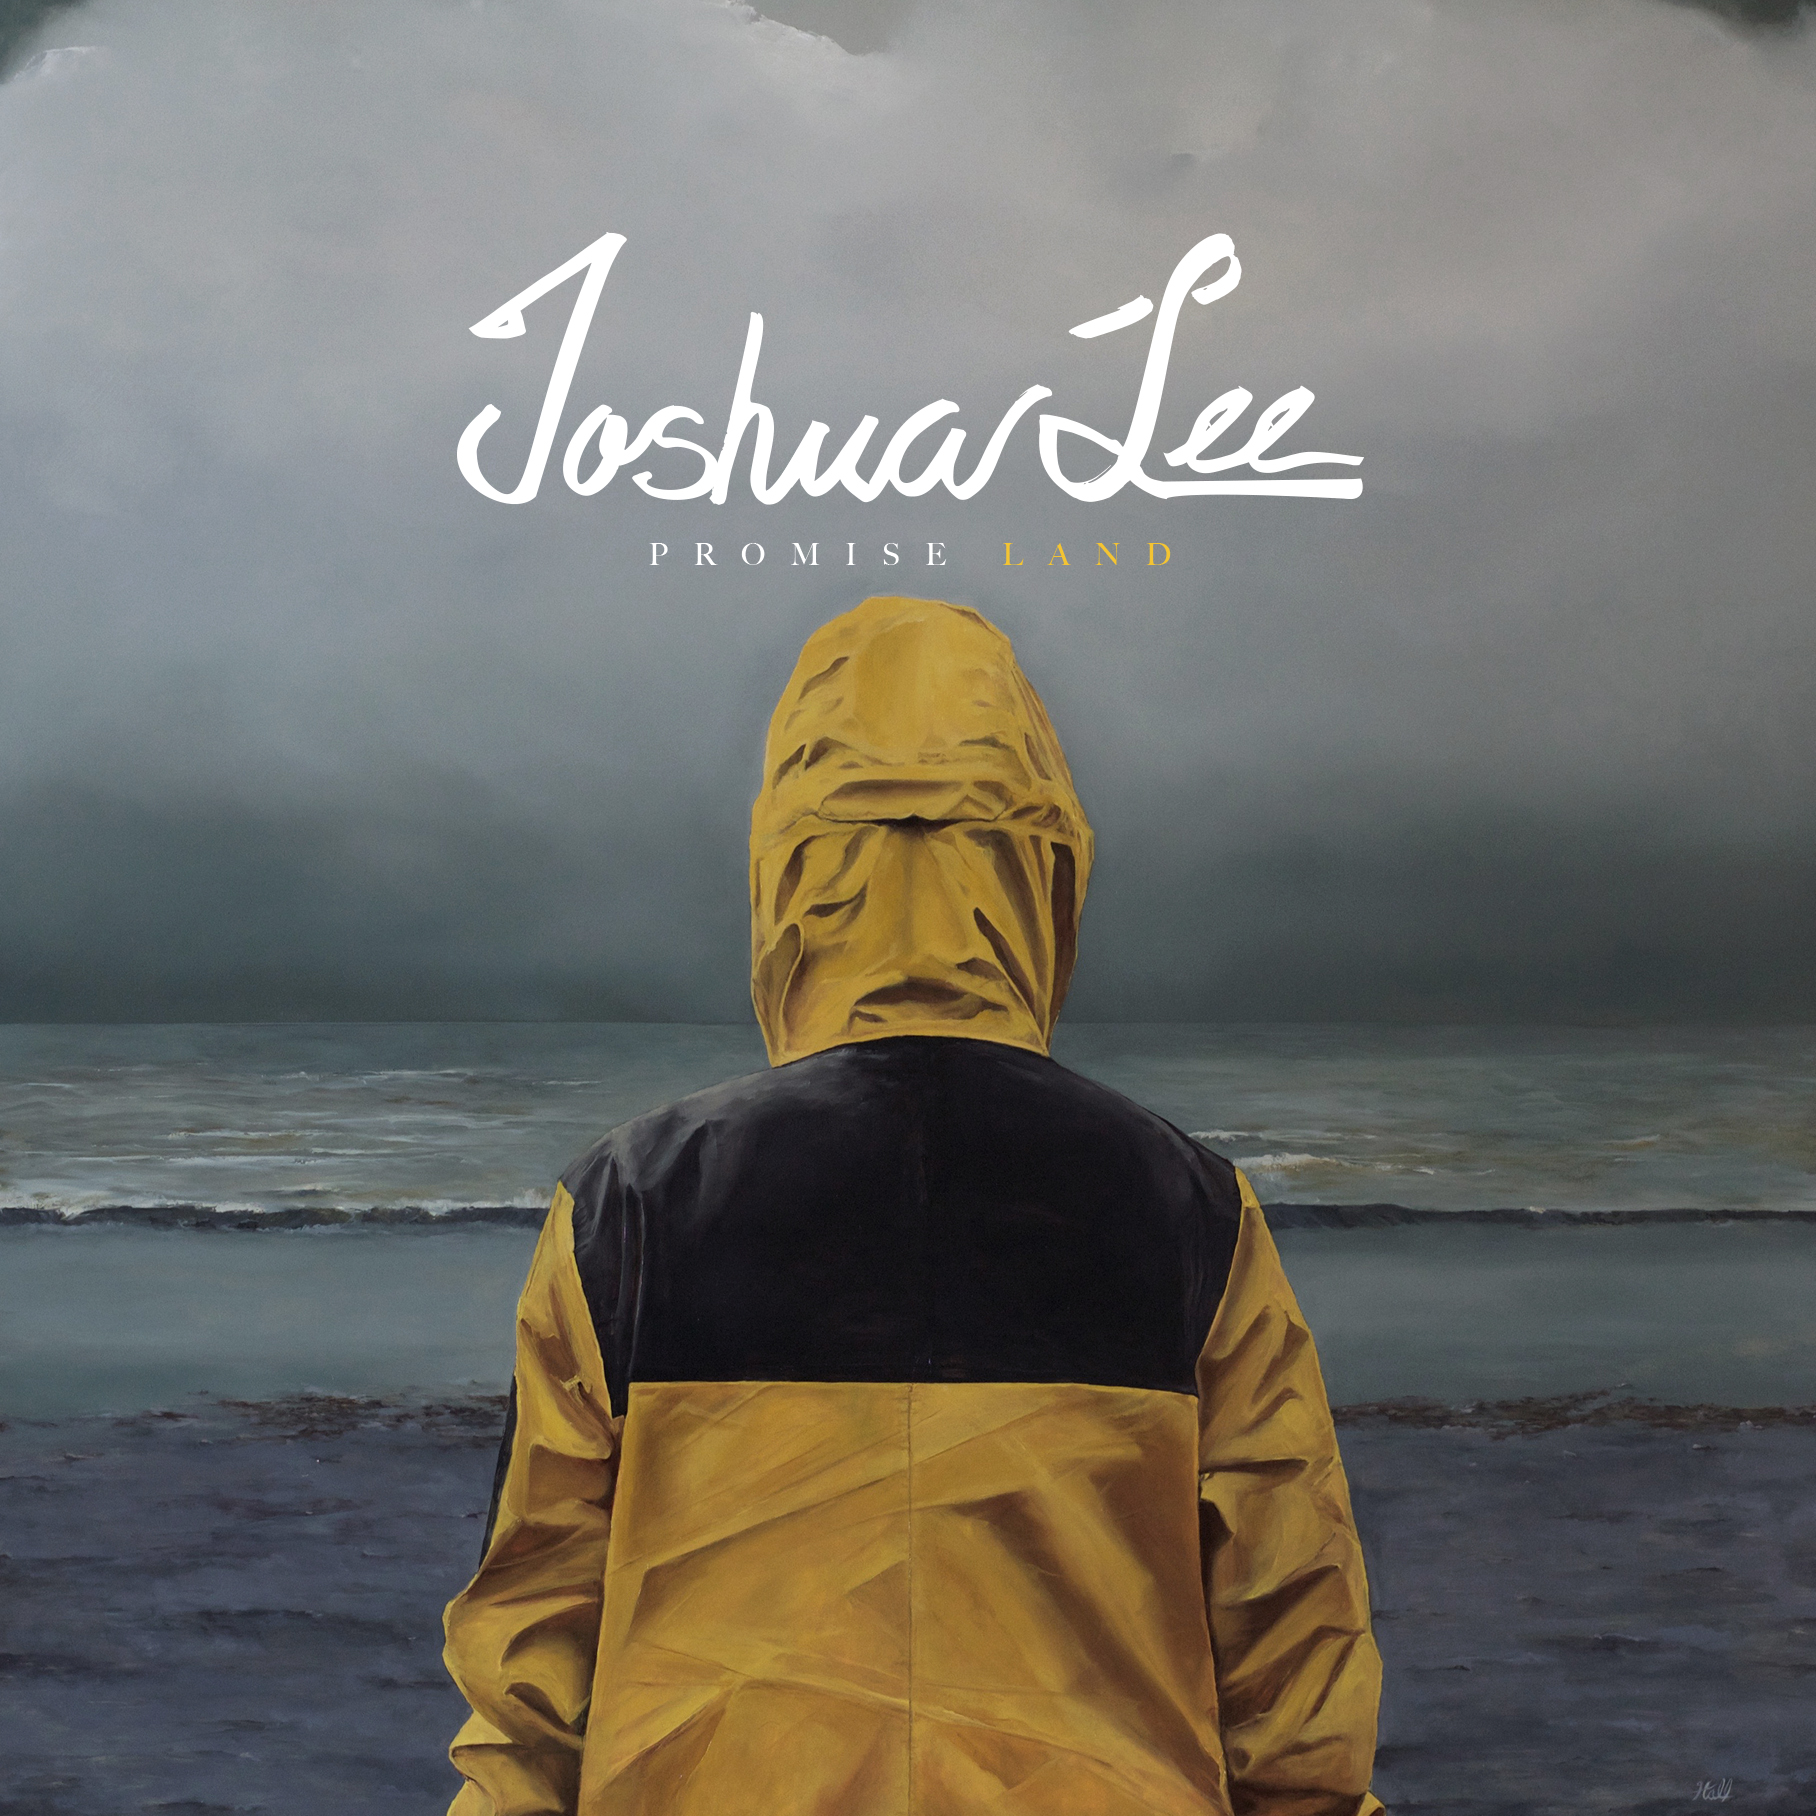 JoshuaLee_AlbumArtwork_Final.jpg